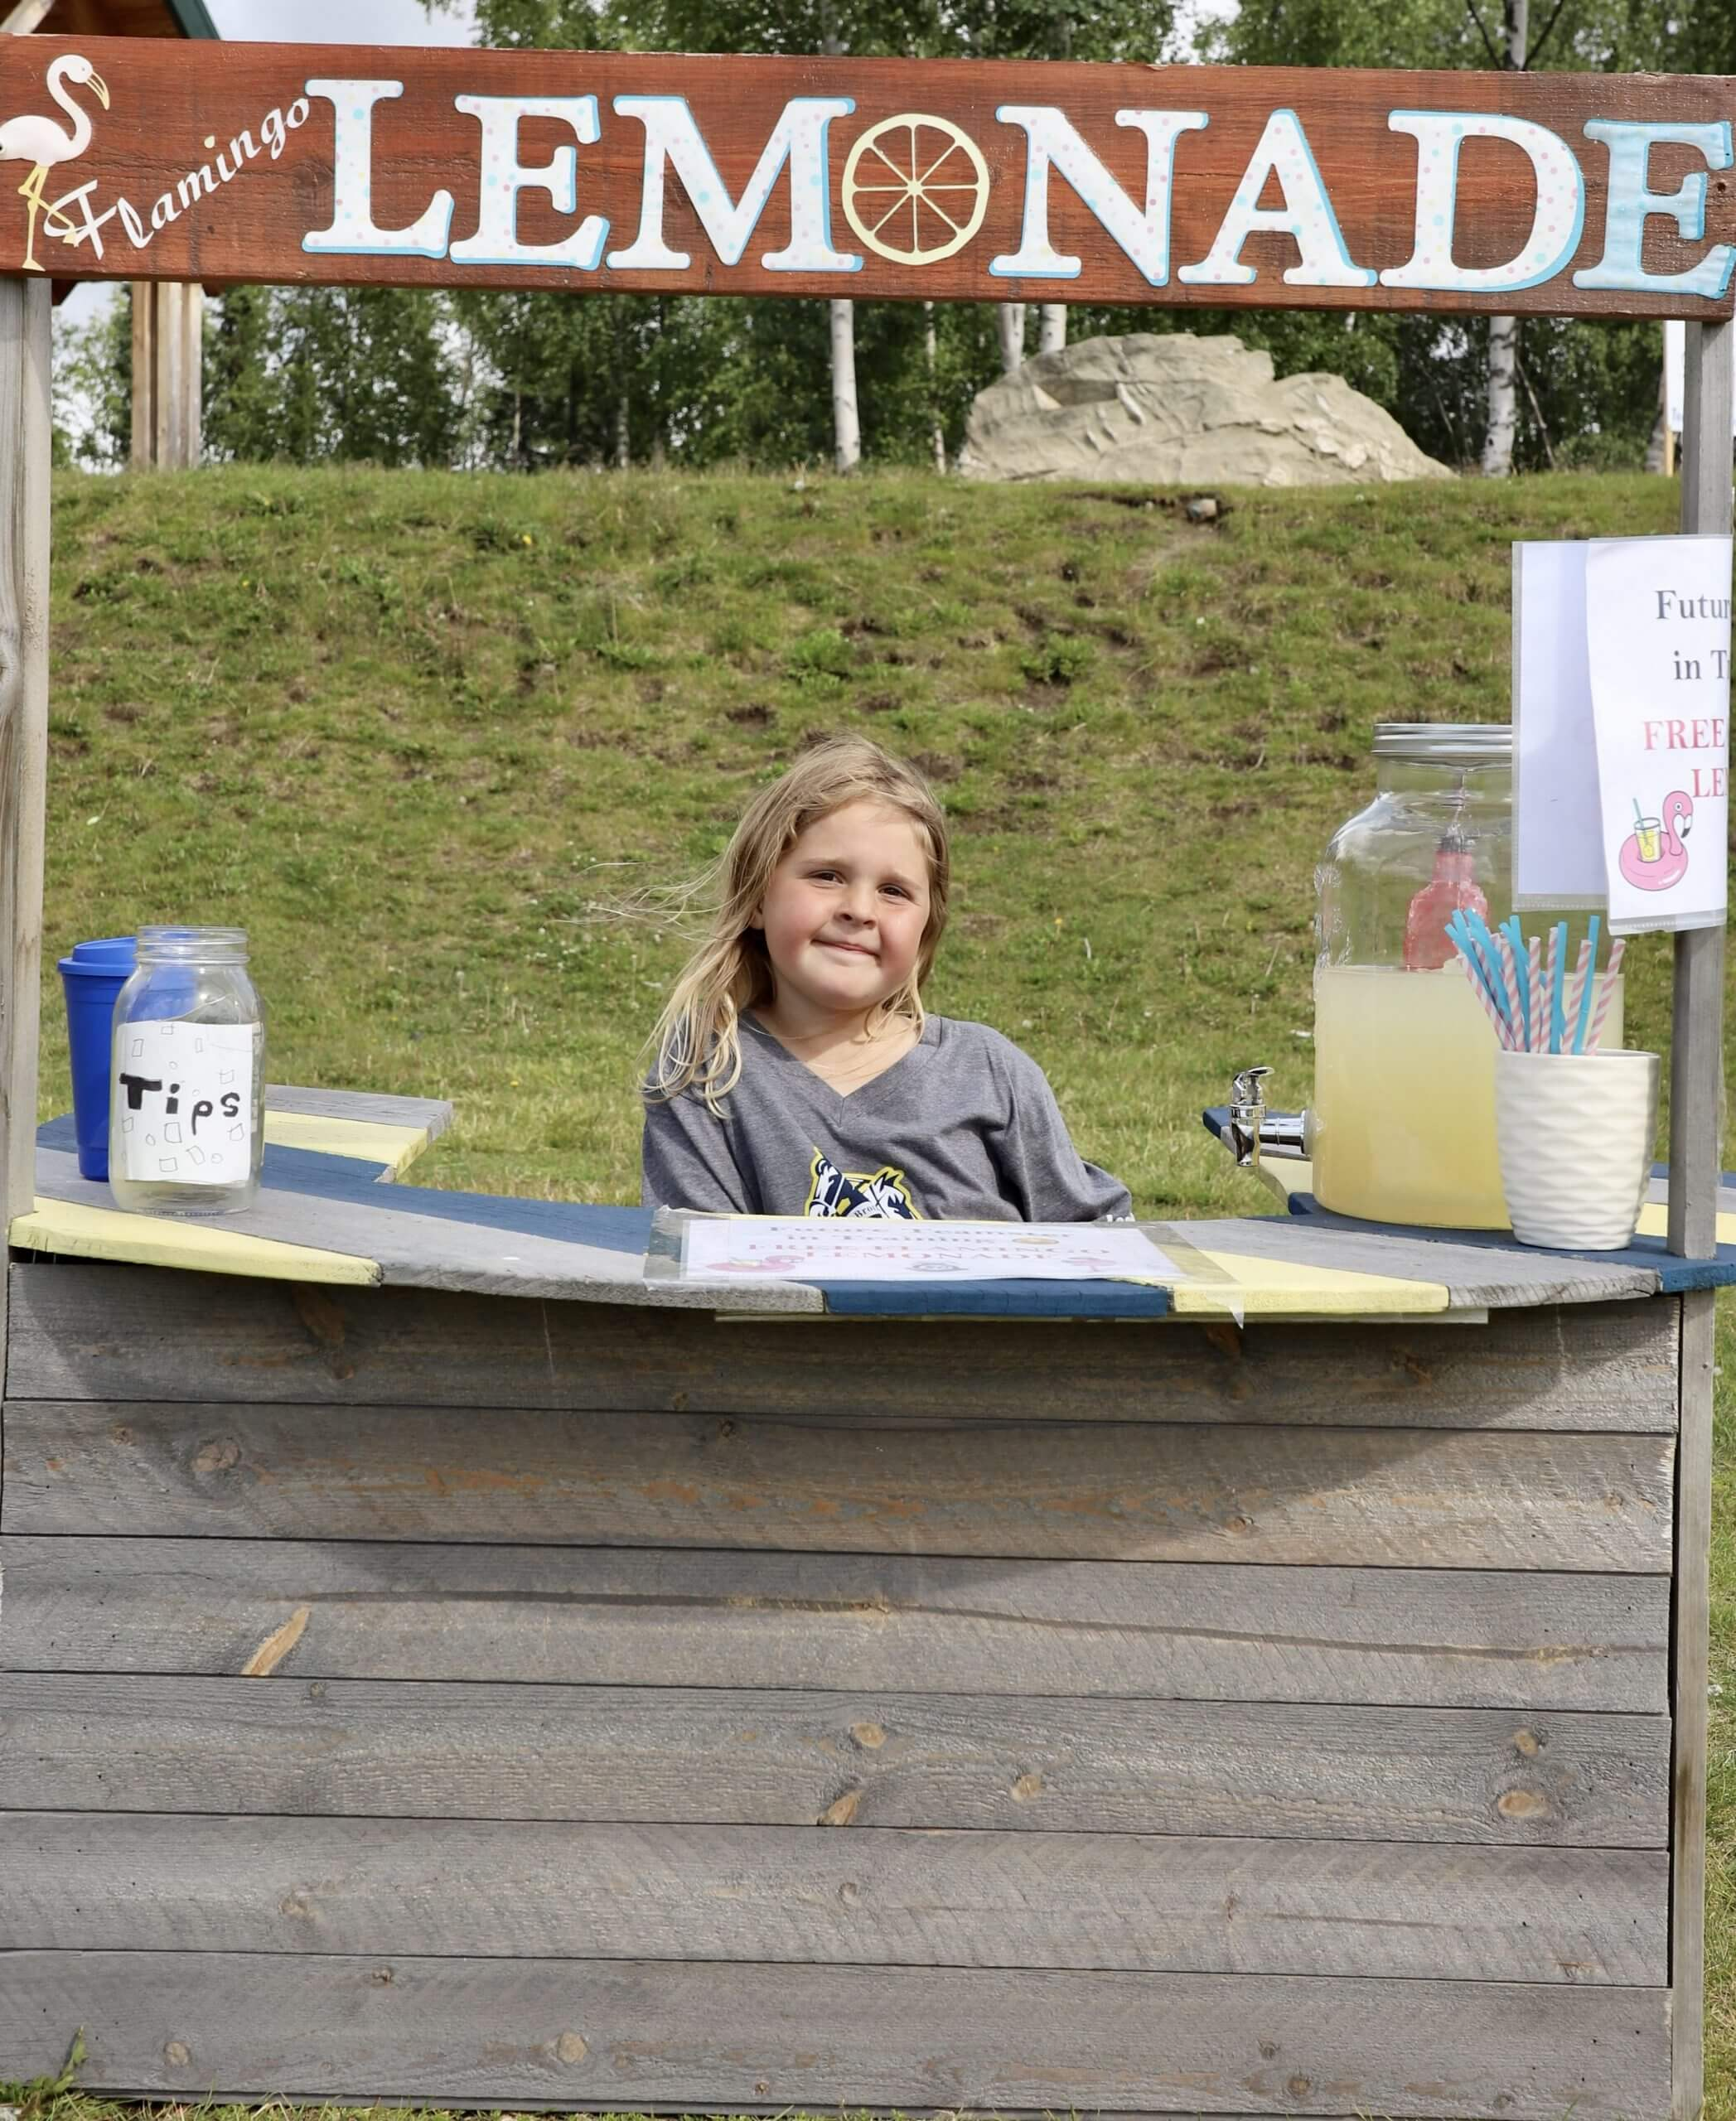 Lemonade Stand, 80 Year Celebration